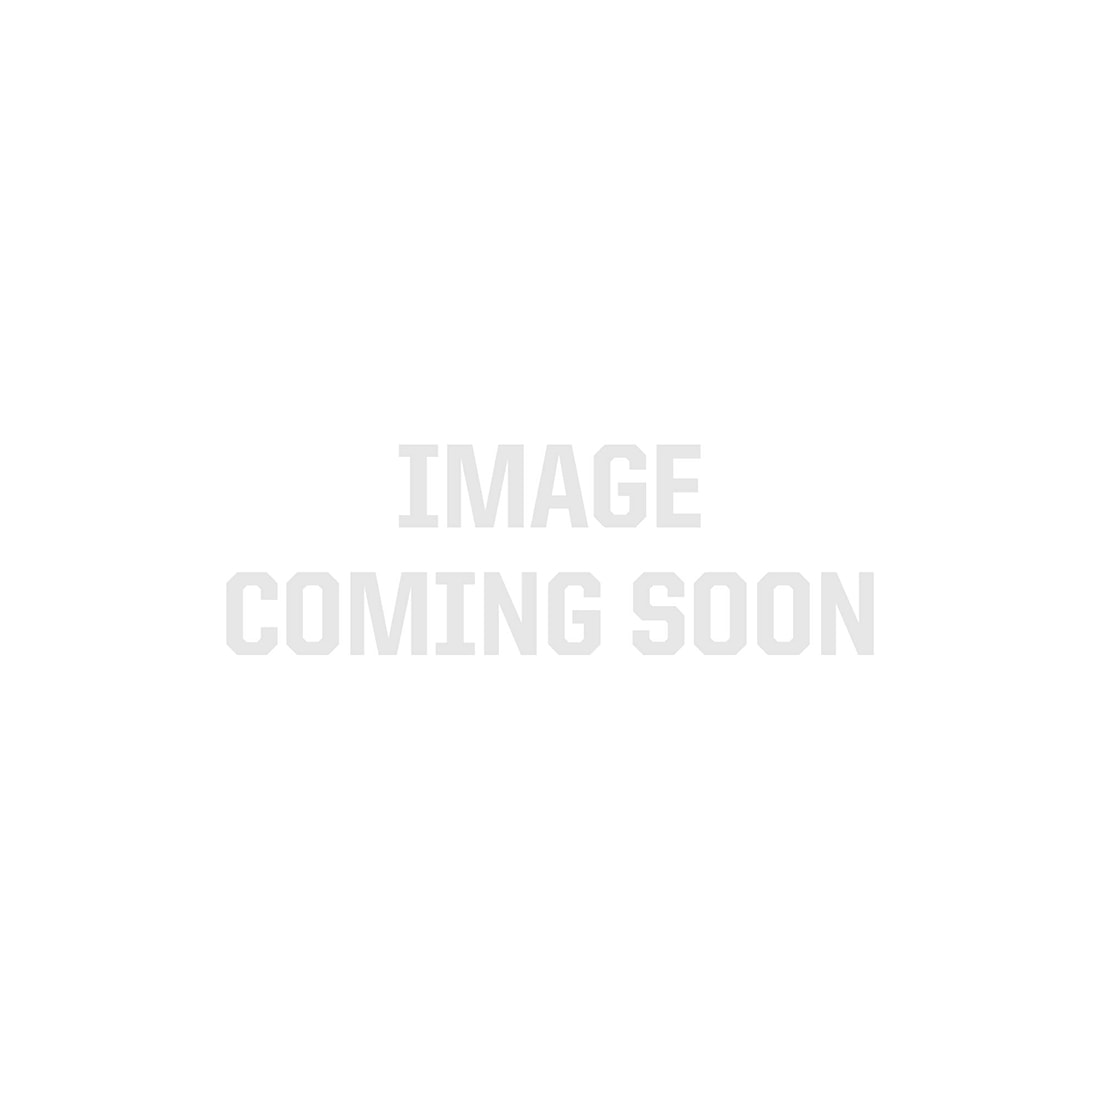 MicroMax VLM LED Driver - 24 VDC - 96W